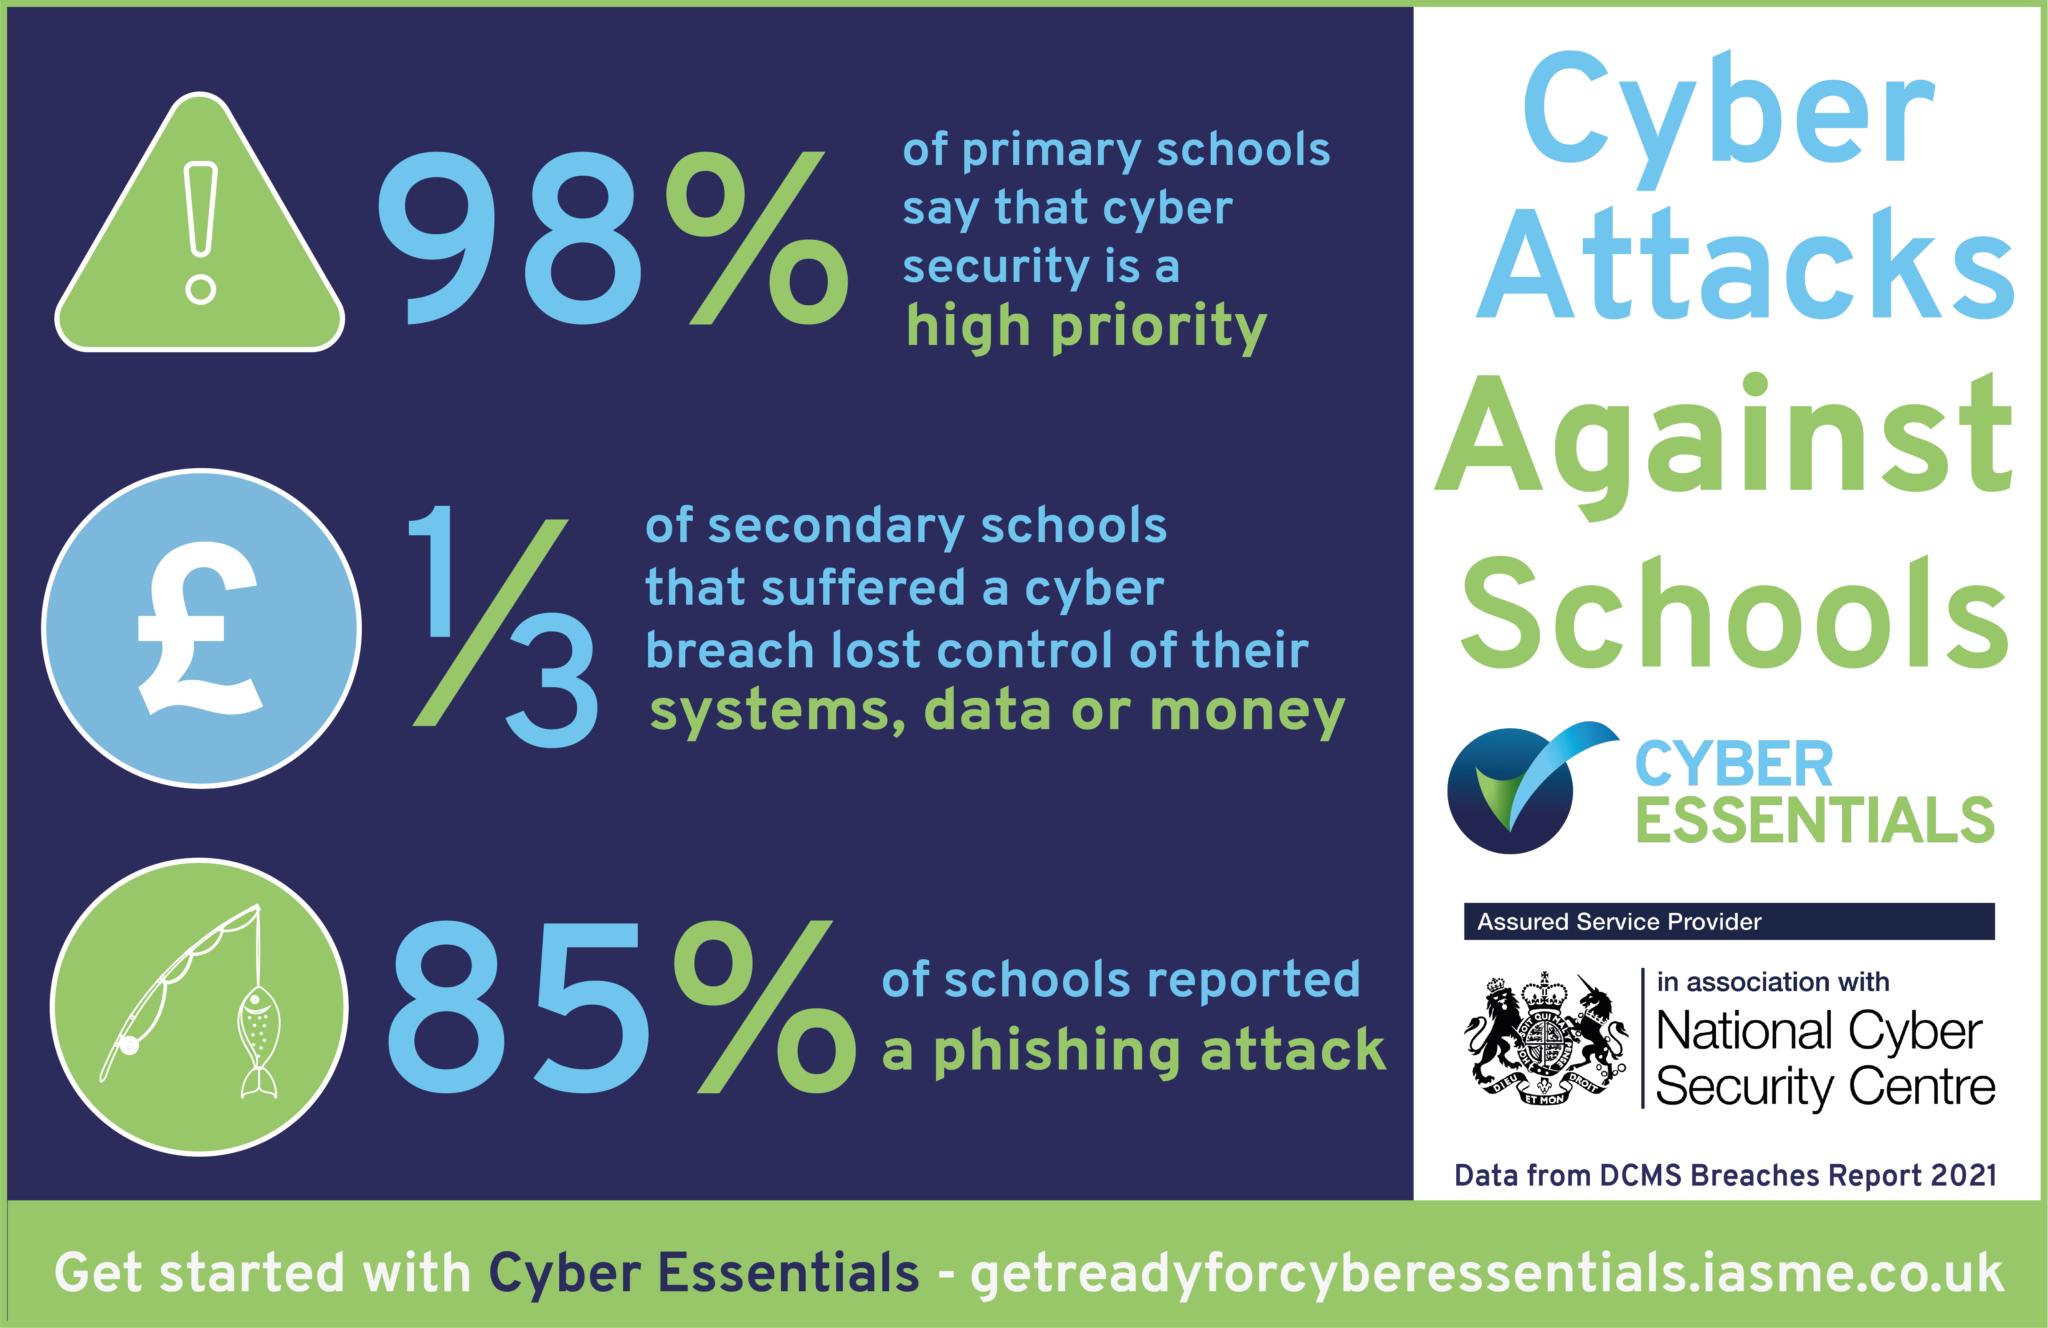 Cyber Essentials Education